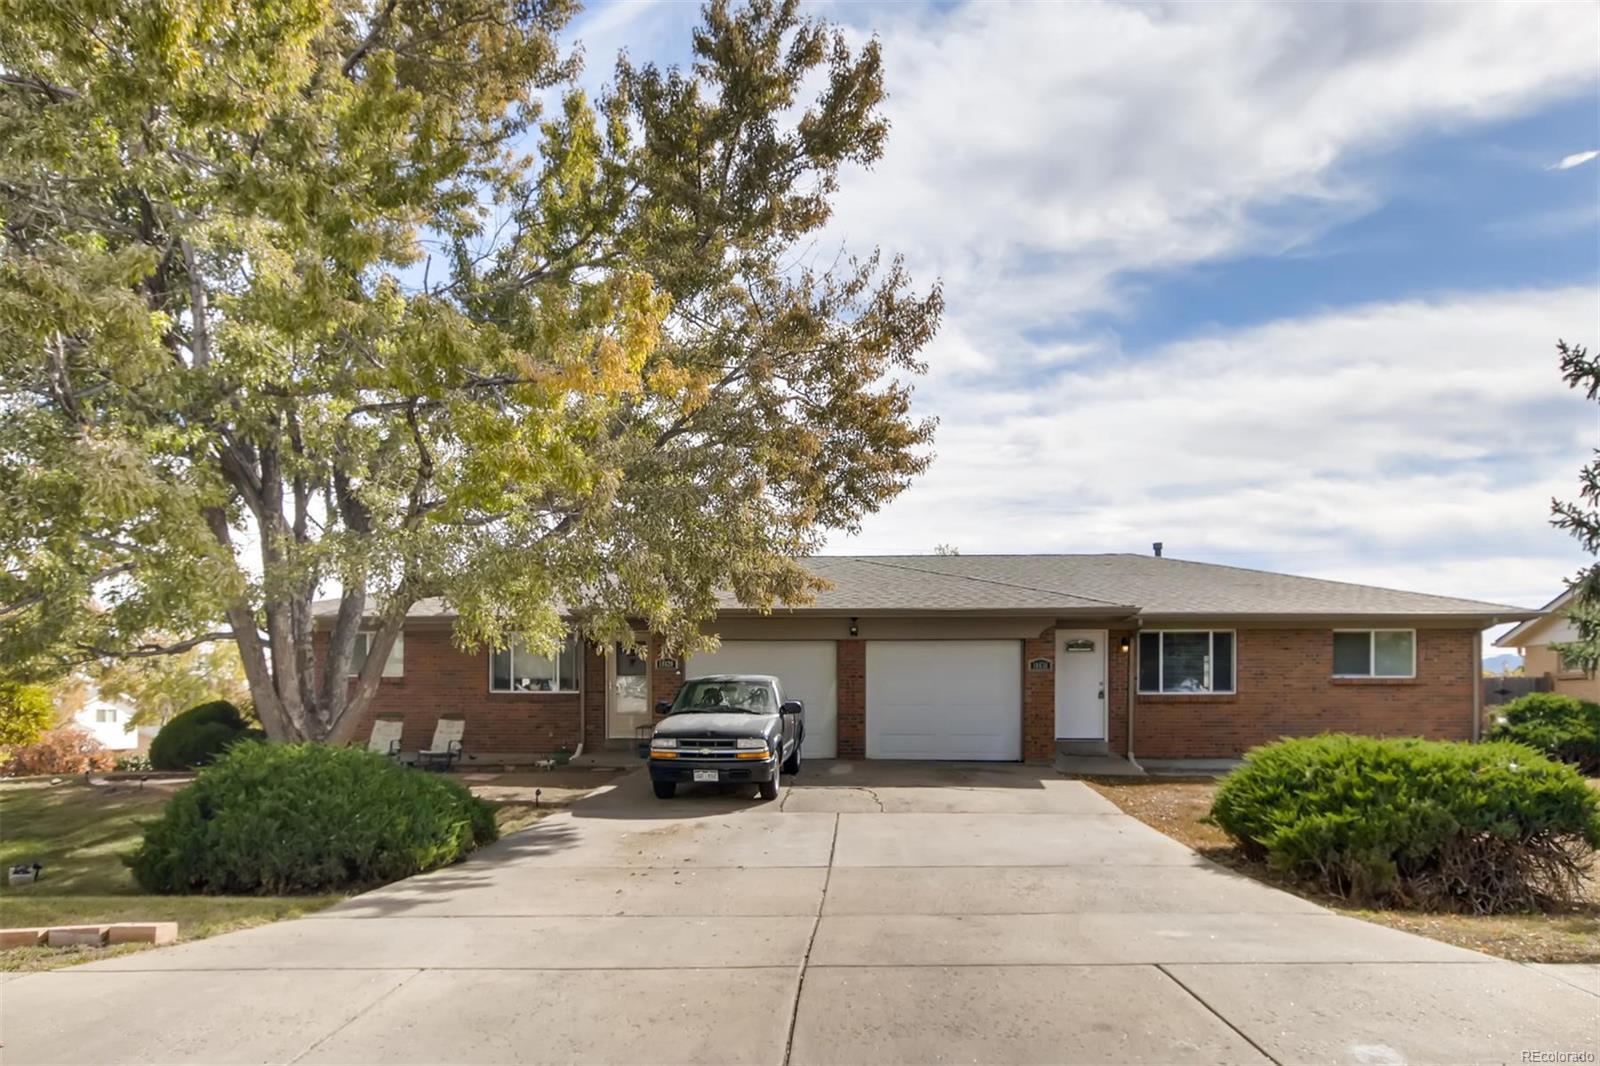 10620 W 13th Avenue, Lakewood, CO 80215 - Lakewood, CO real estate listing